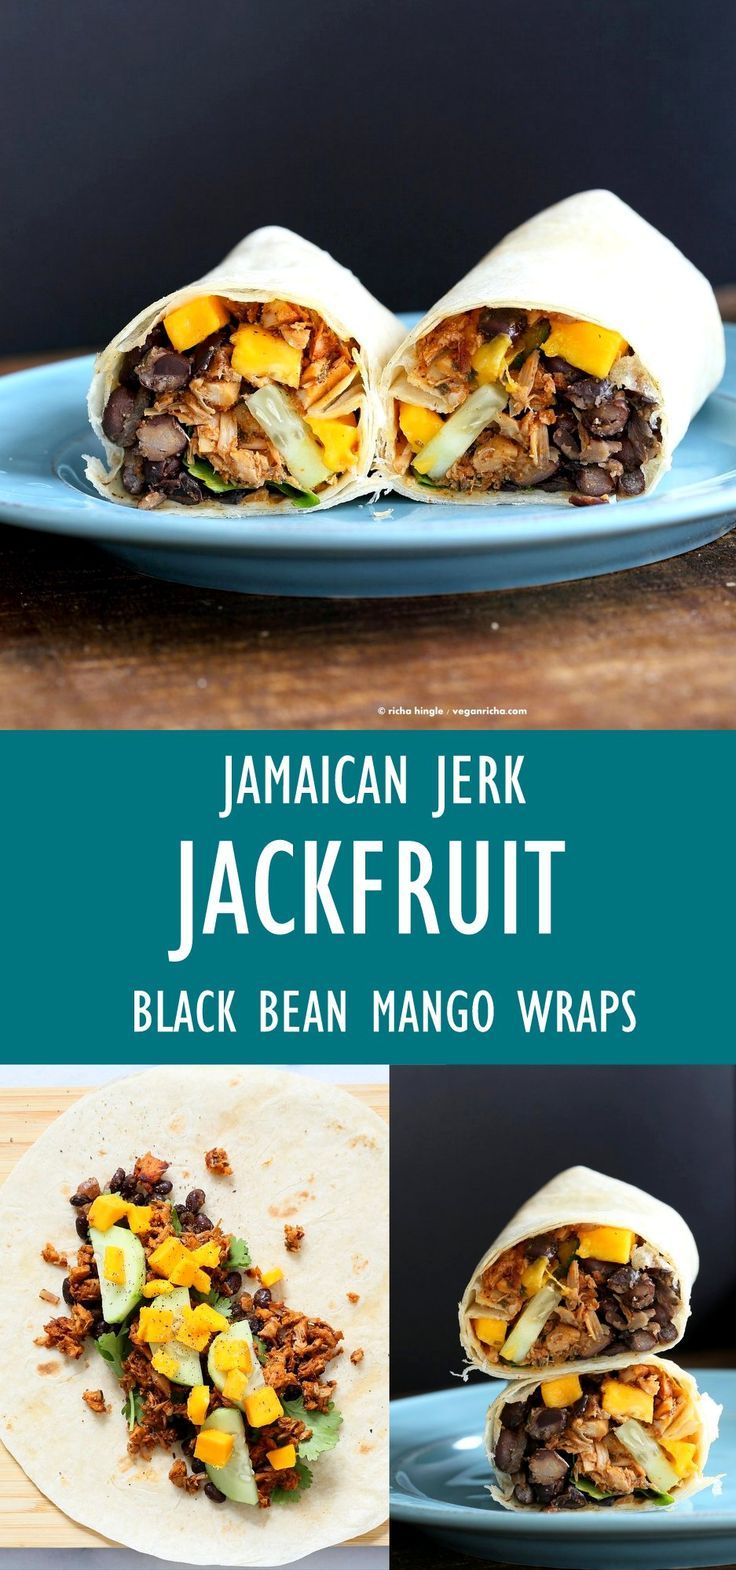 Jamaican Jerk Jackfruit Caribbean Black Bean Mango Wraps. #Vegan #GlutenFree Option #SoyFree